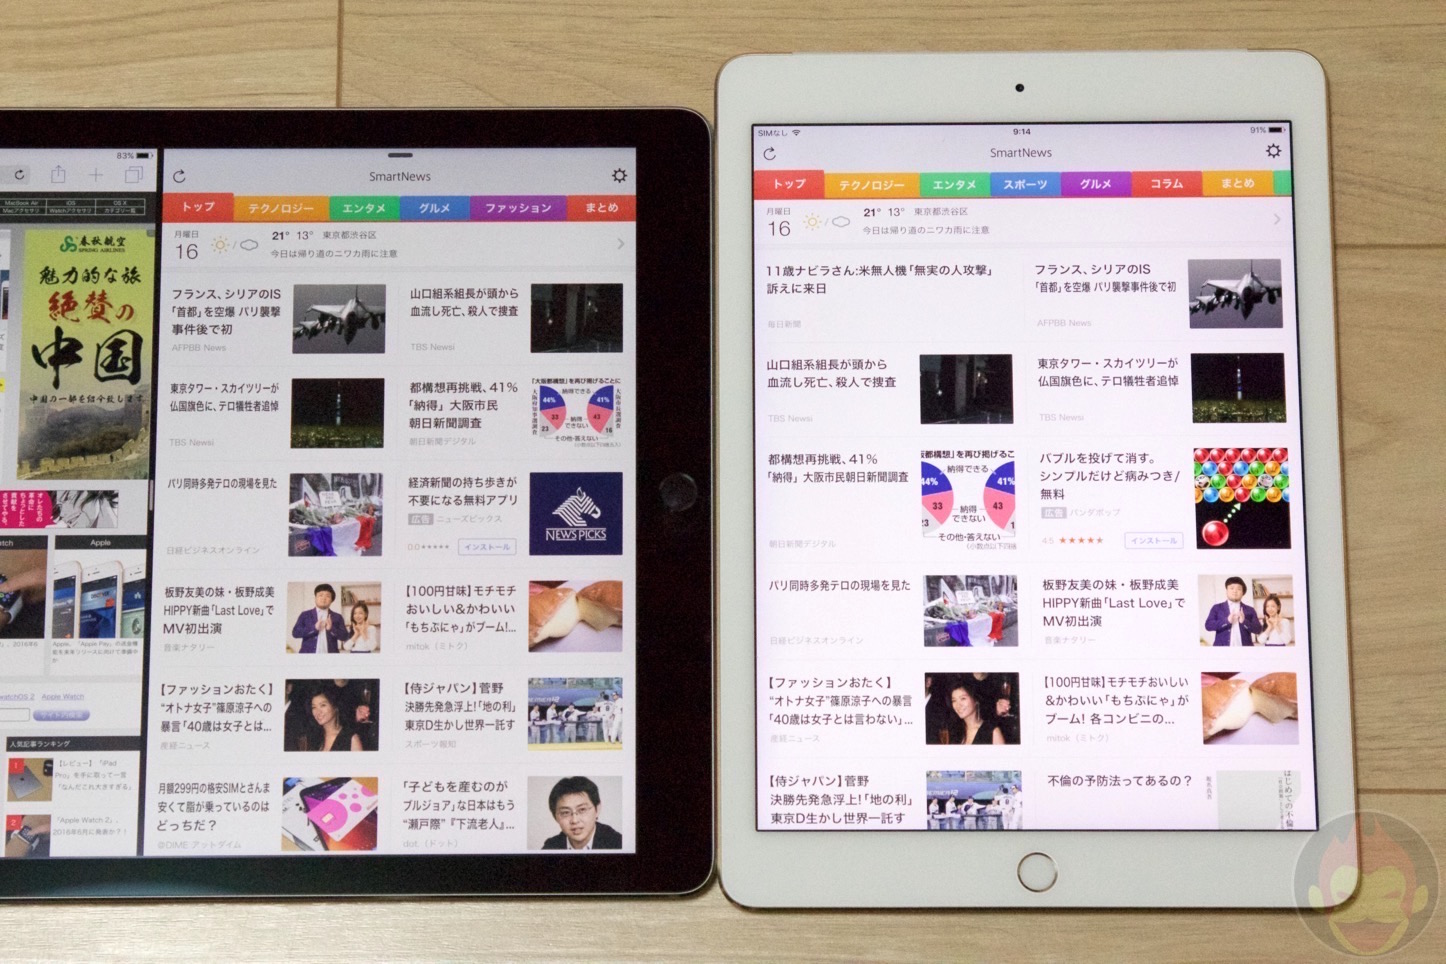 iPad-Pro-Air2-mini2-Comparison-11.jpg